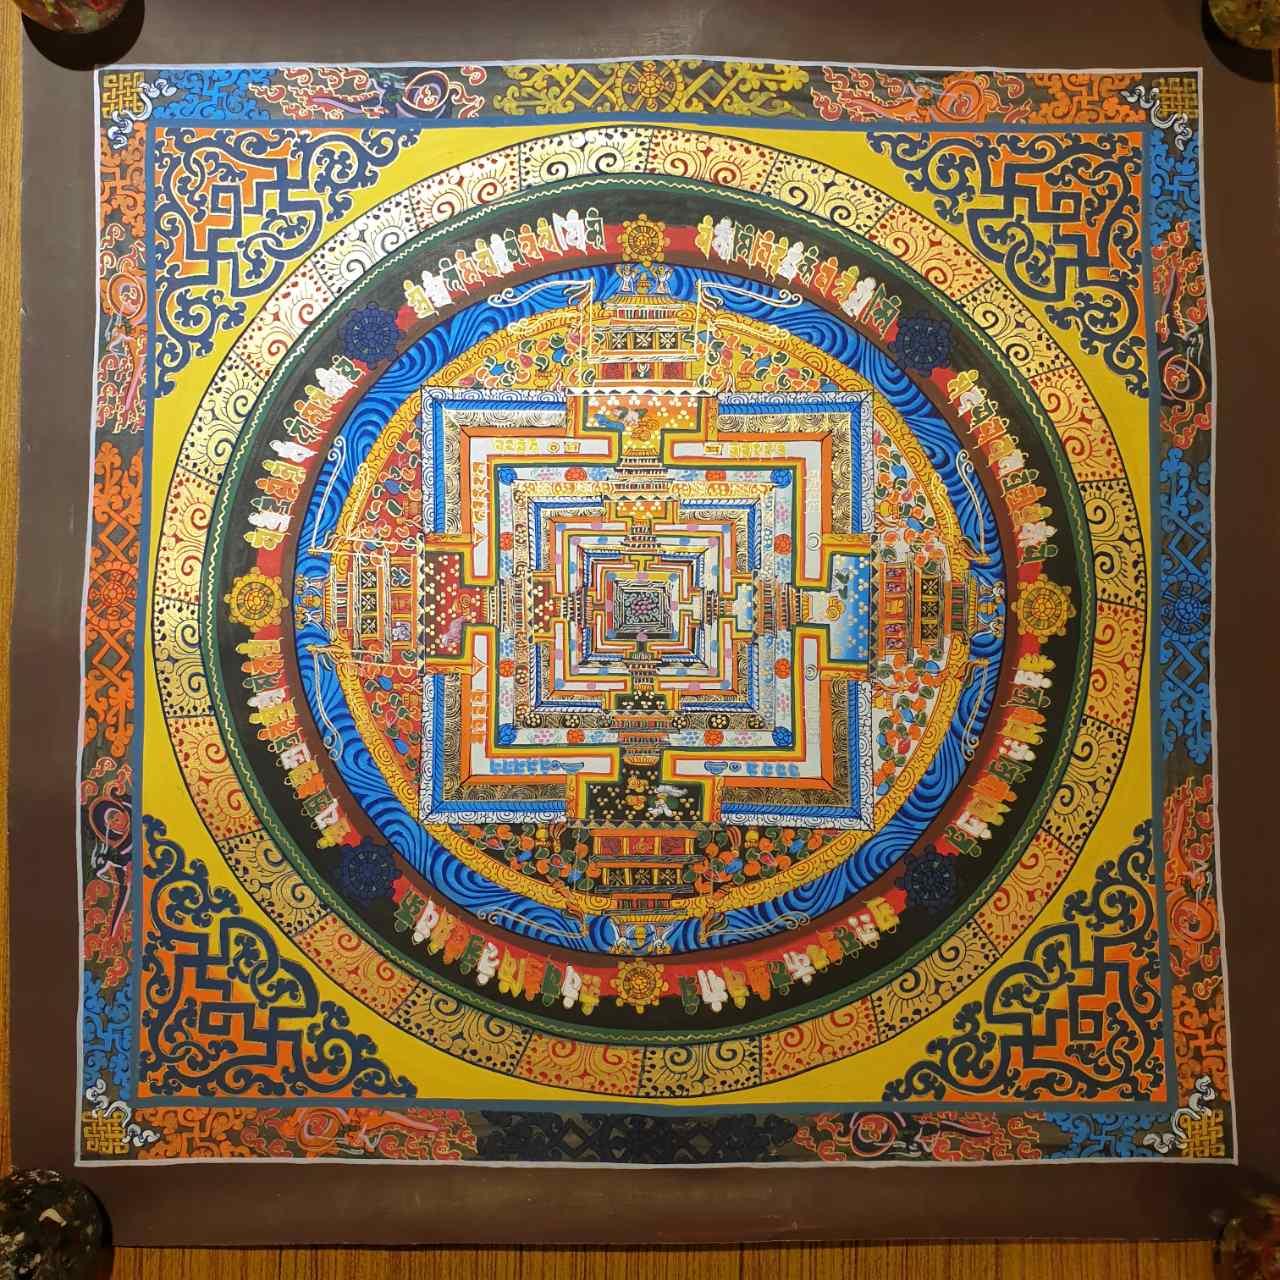 Kalachakra Mandala Thangka Tibetan Buddhist Wall Art Hand Painted